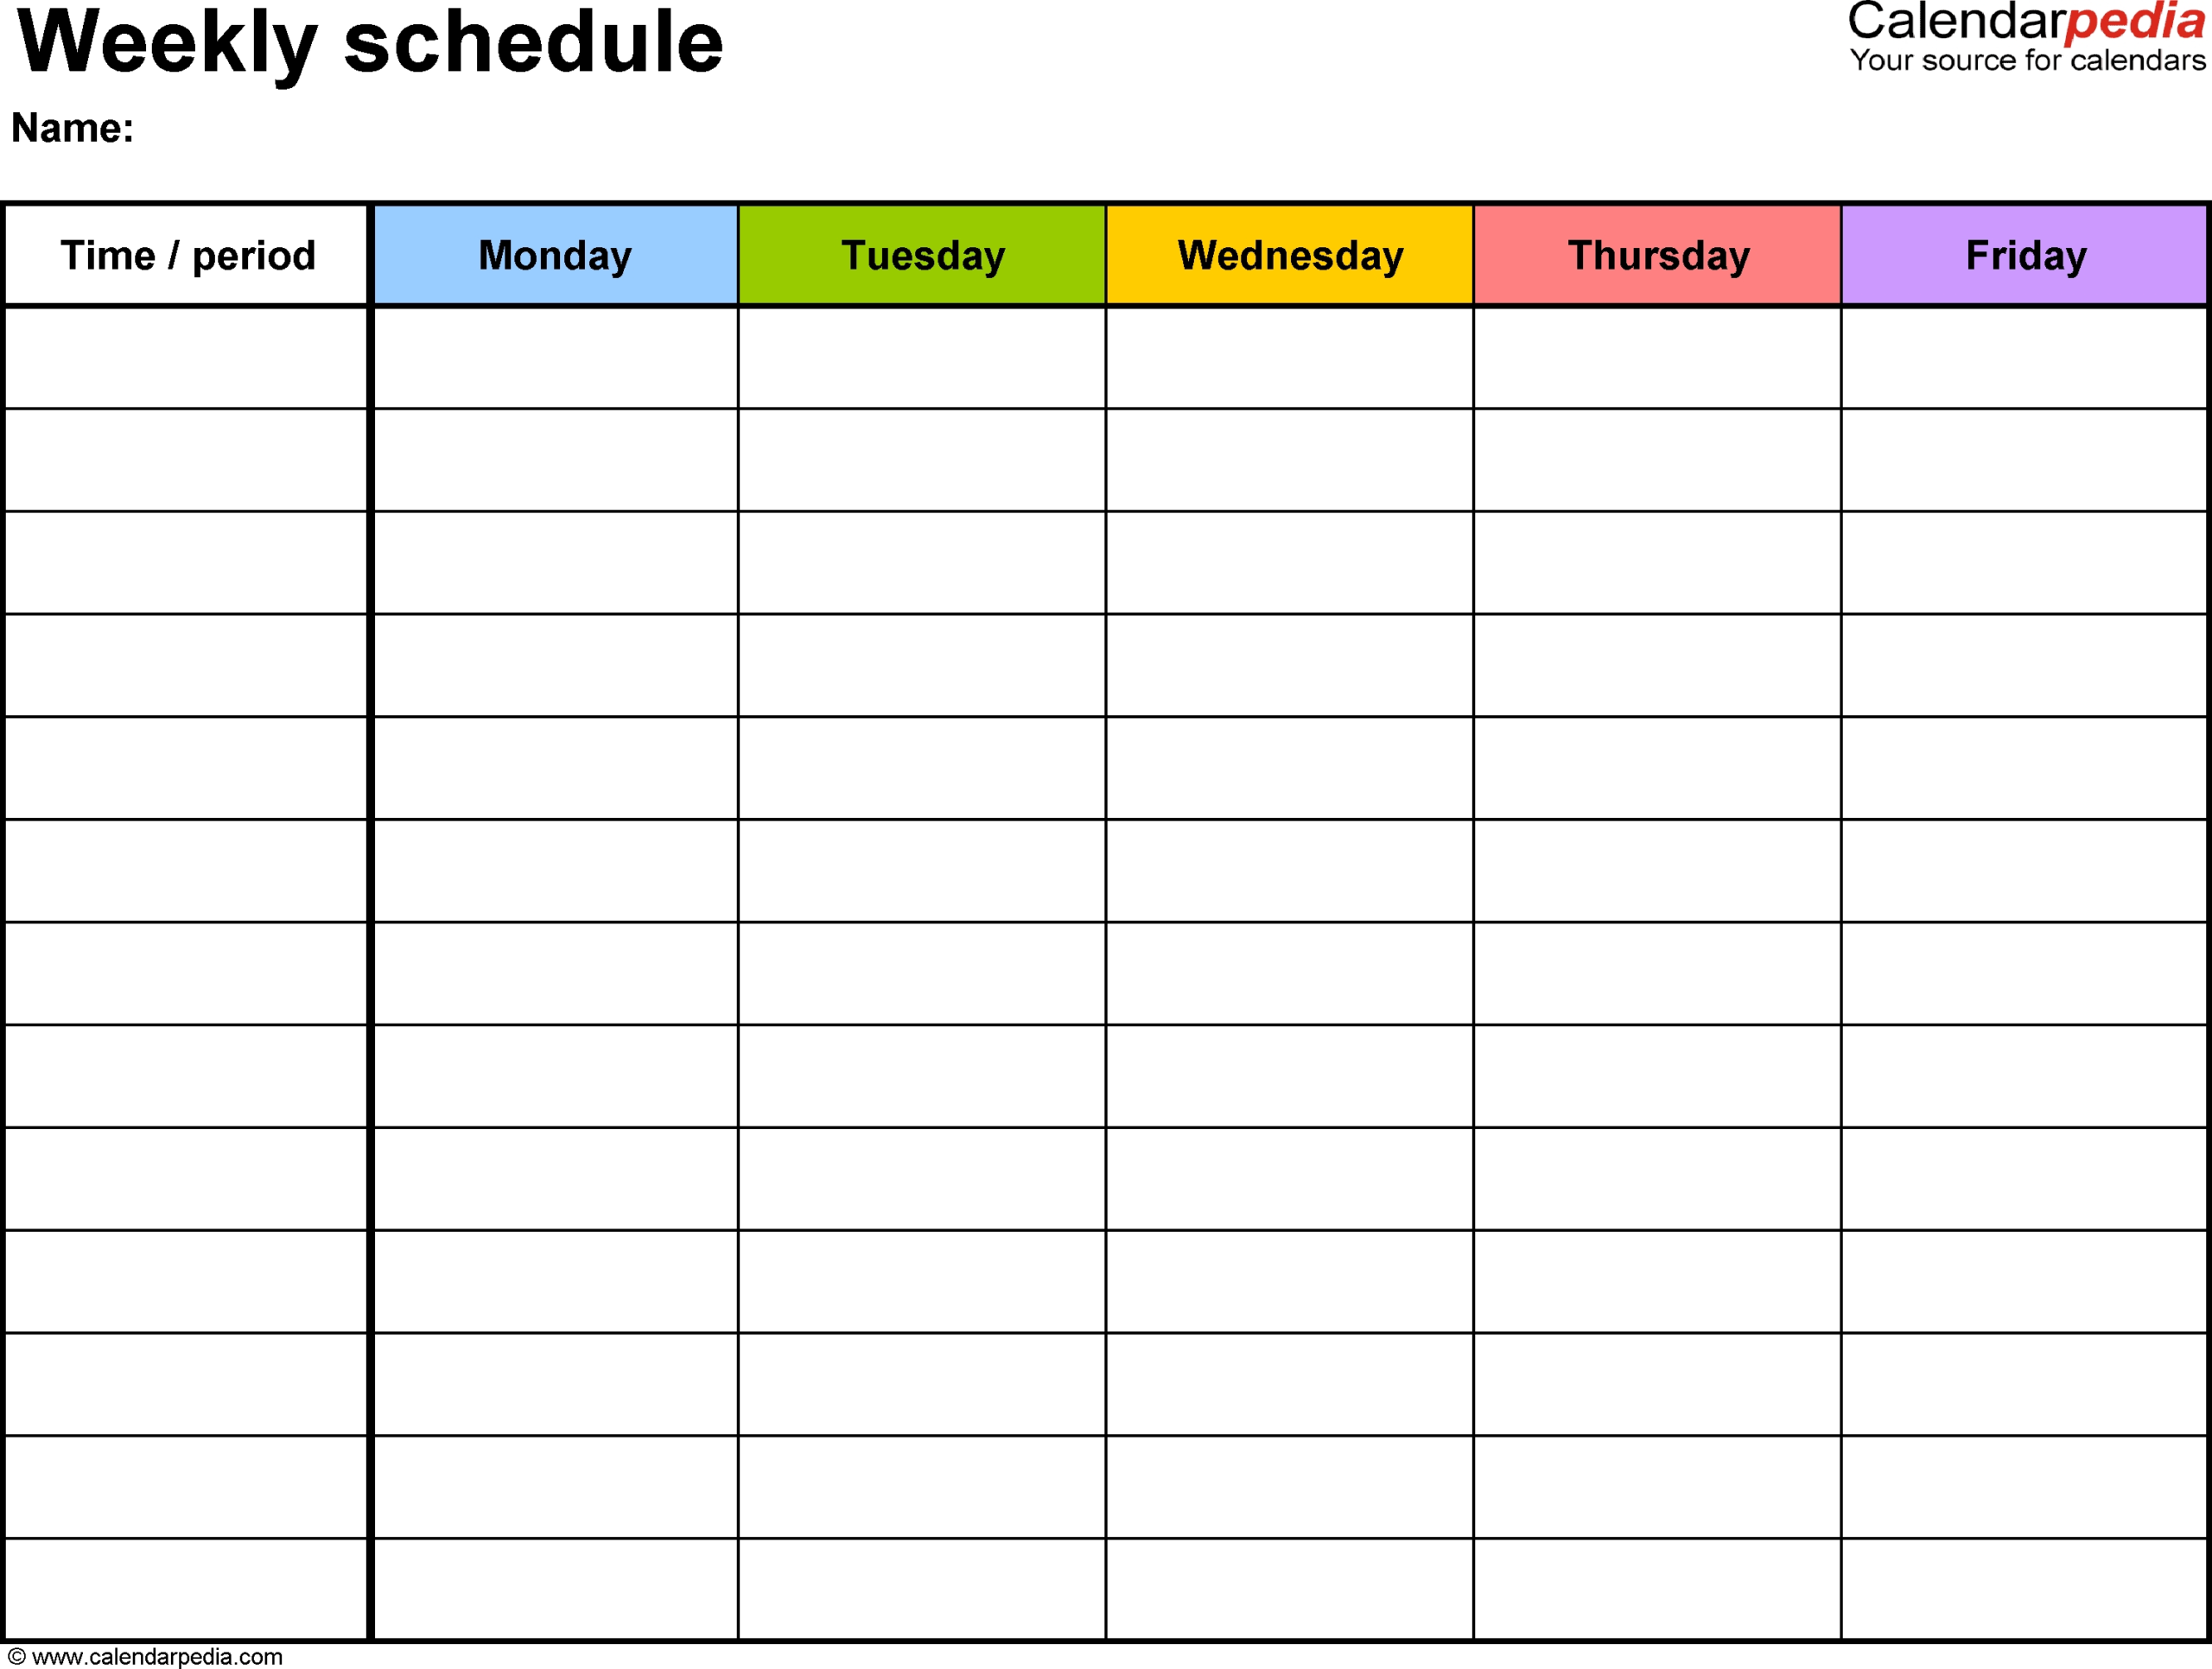 7 Day Blank Calendar Template  Calendar Inspiration Design intended for 7 Day Planner Template